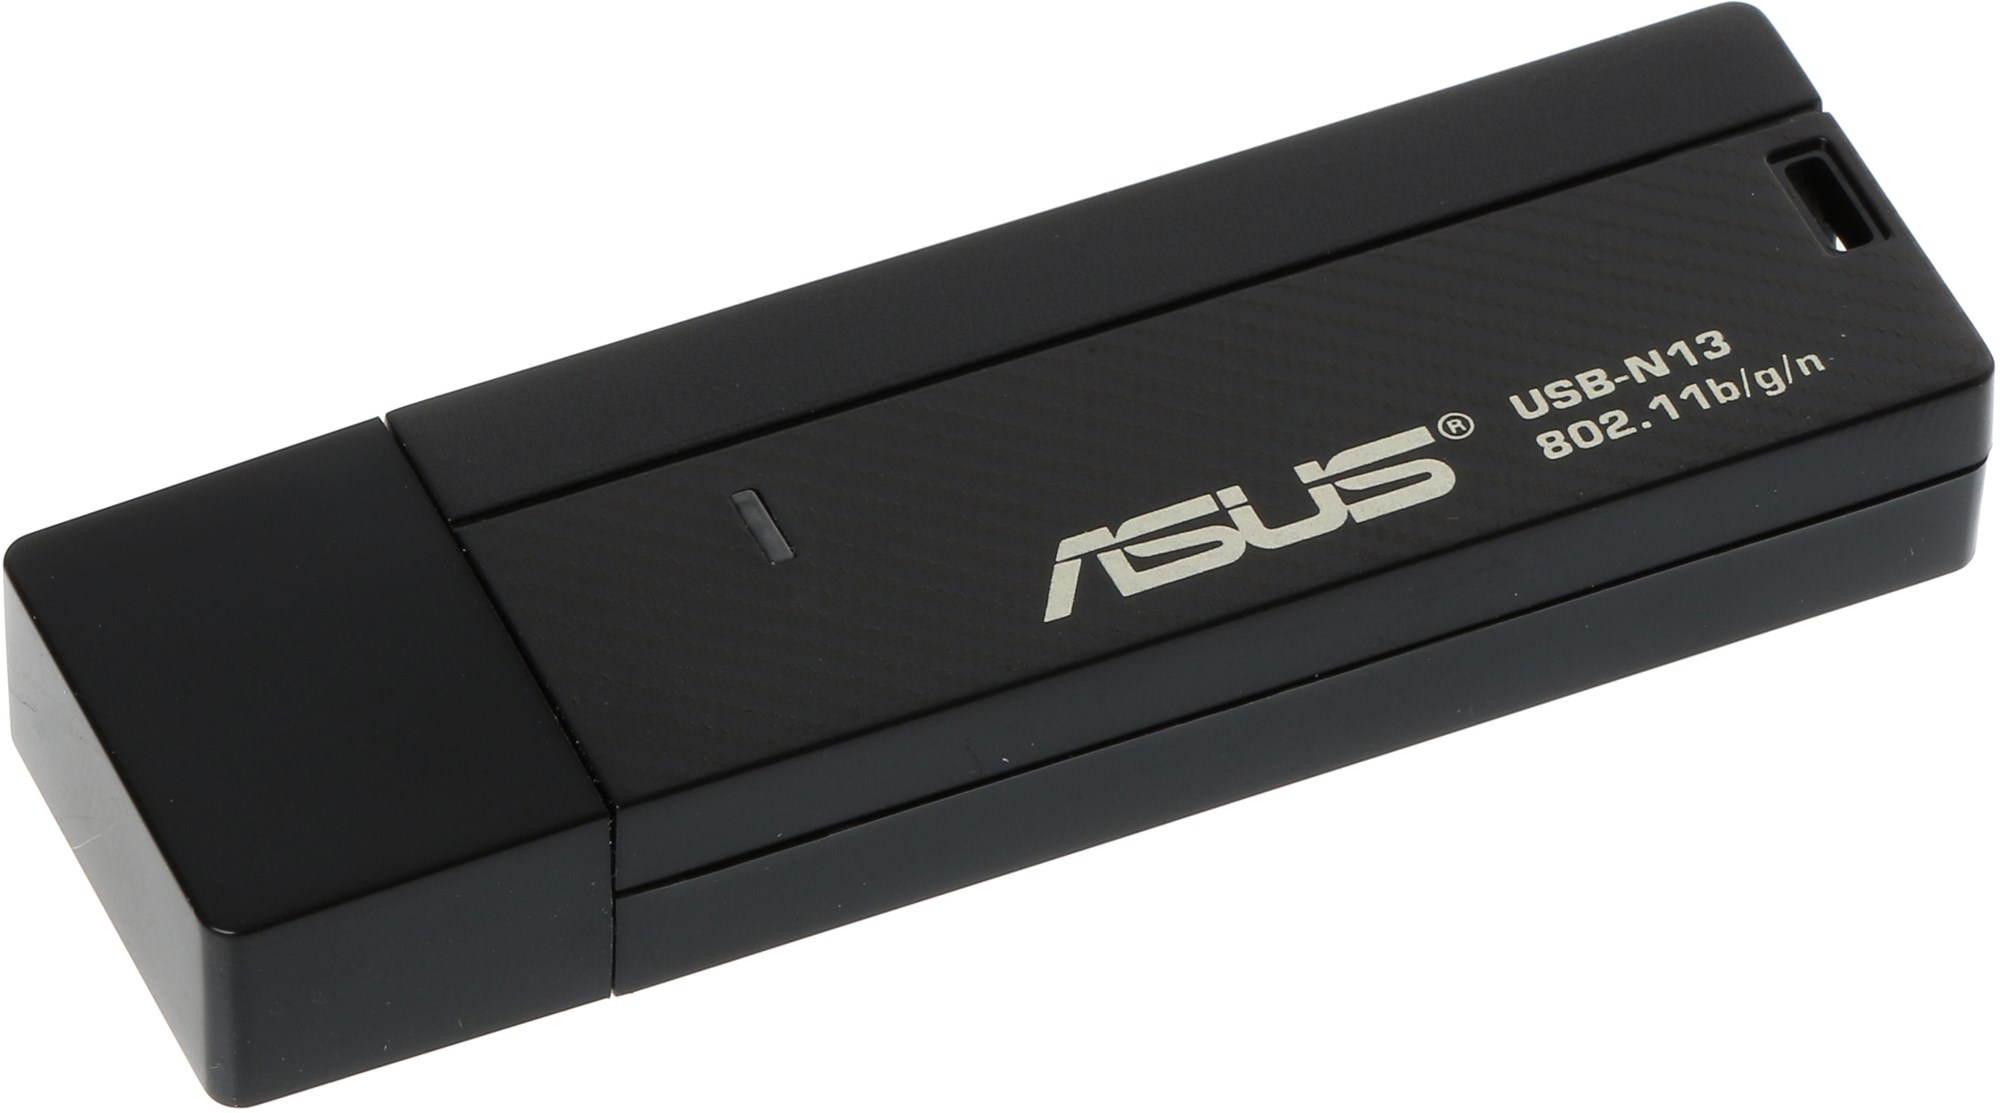 WiFi USB adaptér ASUS USB-N13